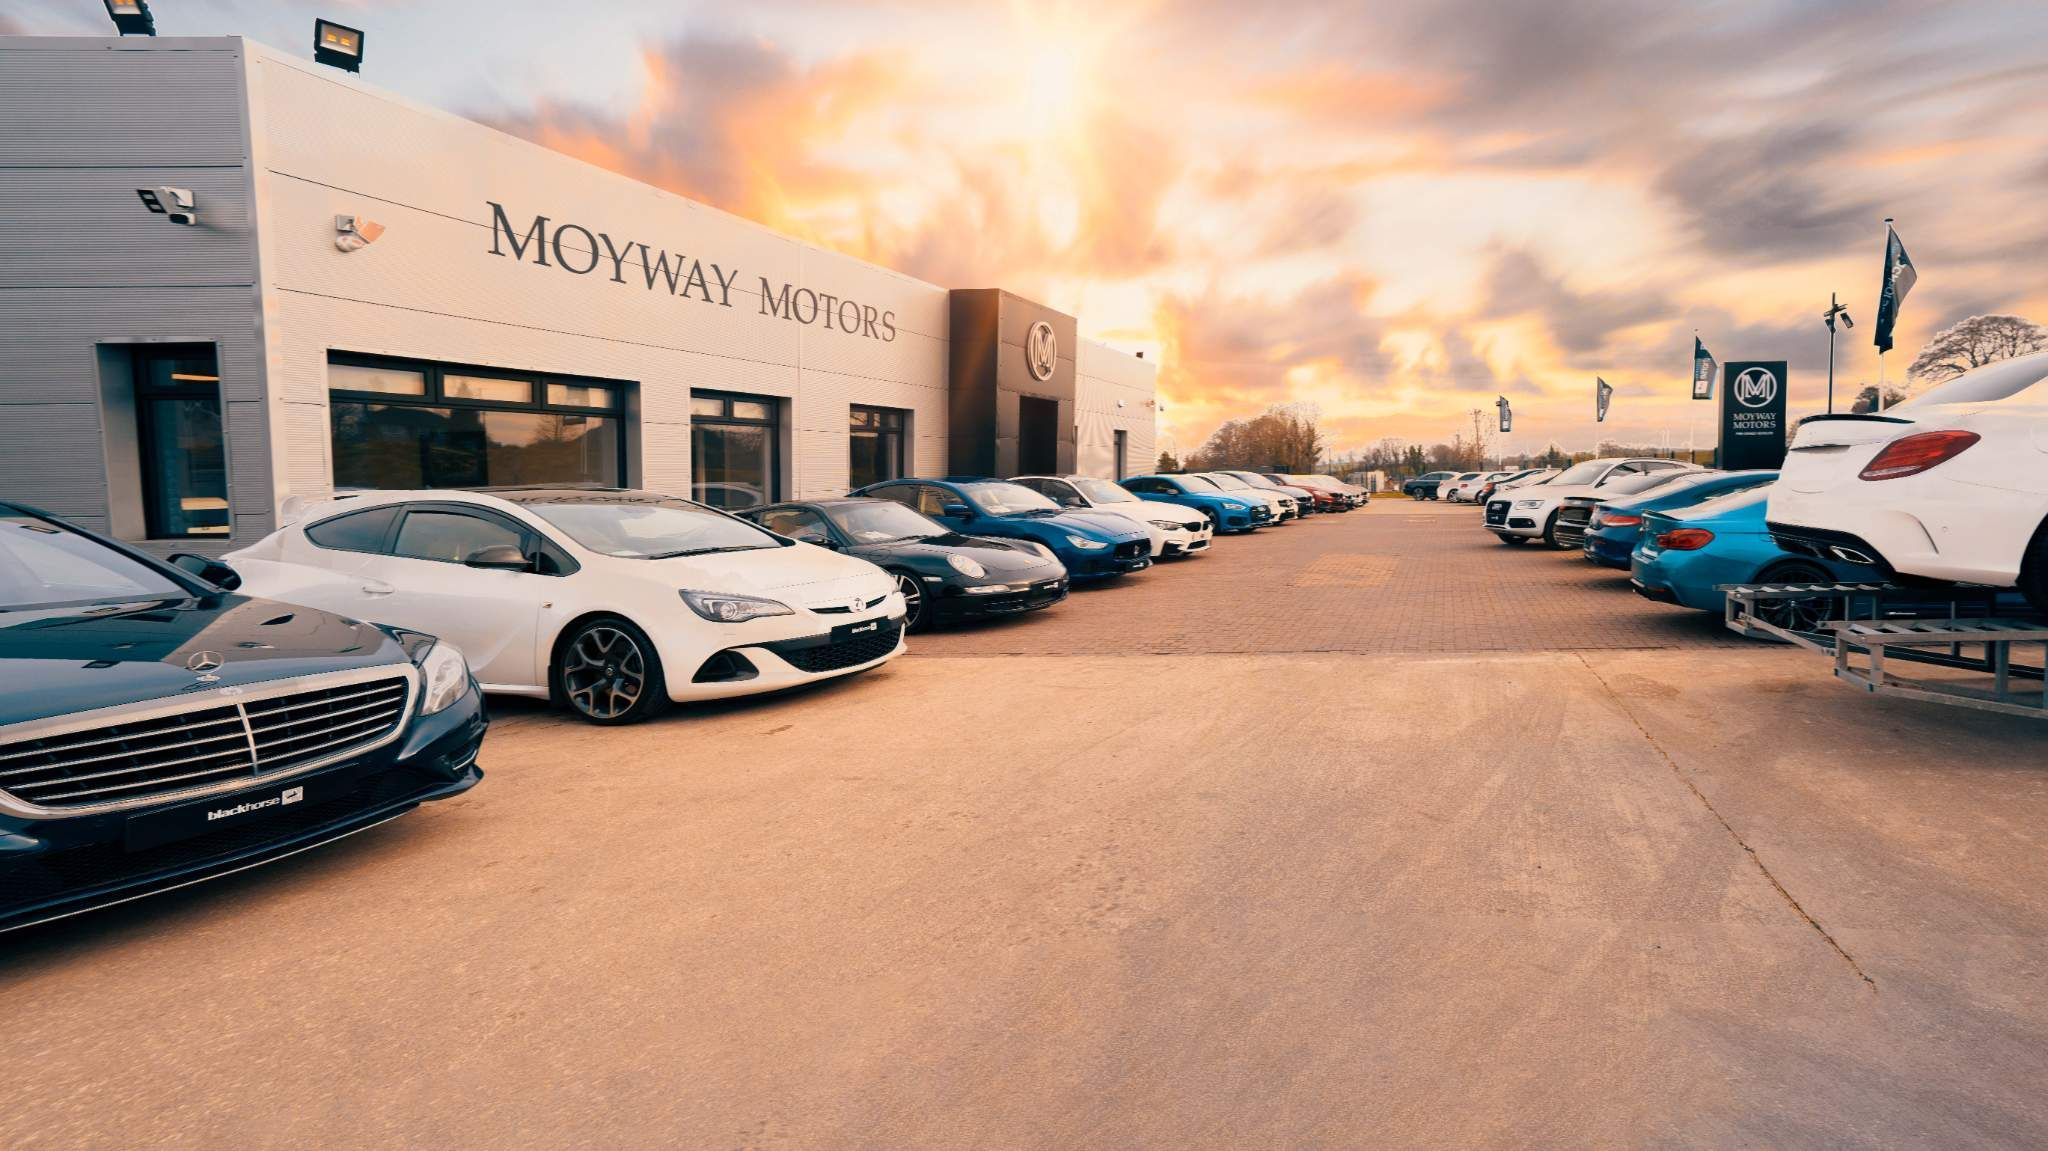 2018 Mercedes-Benz A Class 1.5 A180d Sport 7G-DCT (s/s) 5dr Diesel Automatic – Moyway Motors Dungannon full